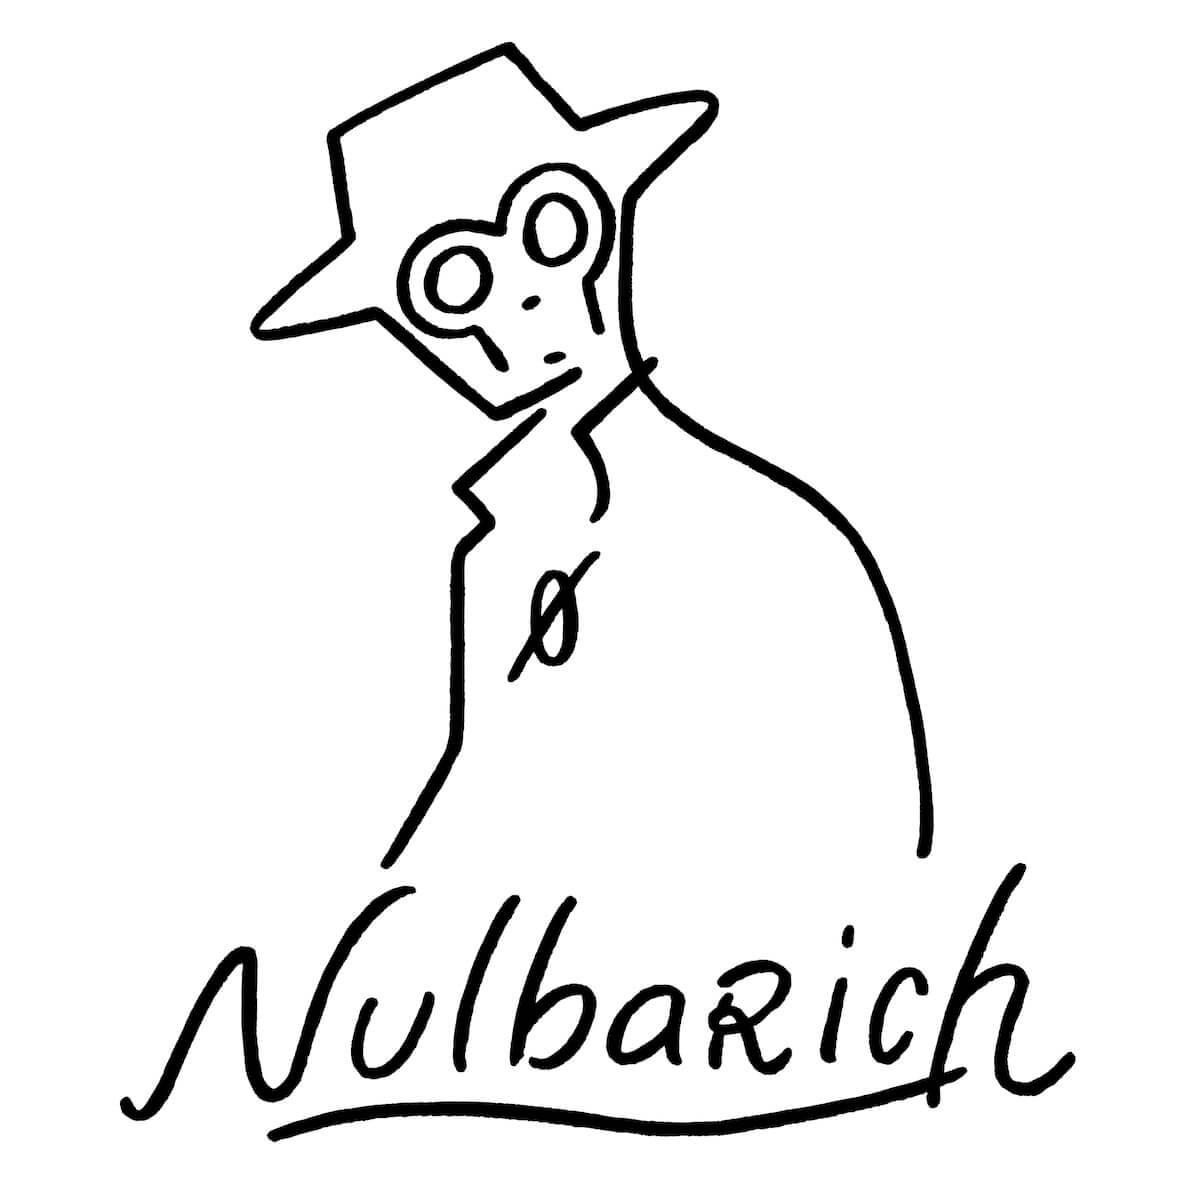 Nulbarich、テレビ東京「デザイナー 渋井直人の休日」エンディングテーマ曲のMV公開 video19018-nulbarich-3-1200x1200